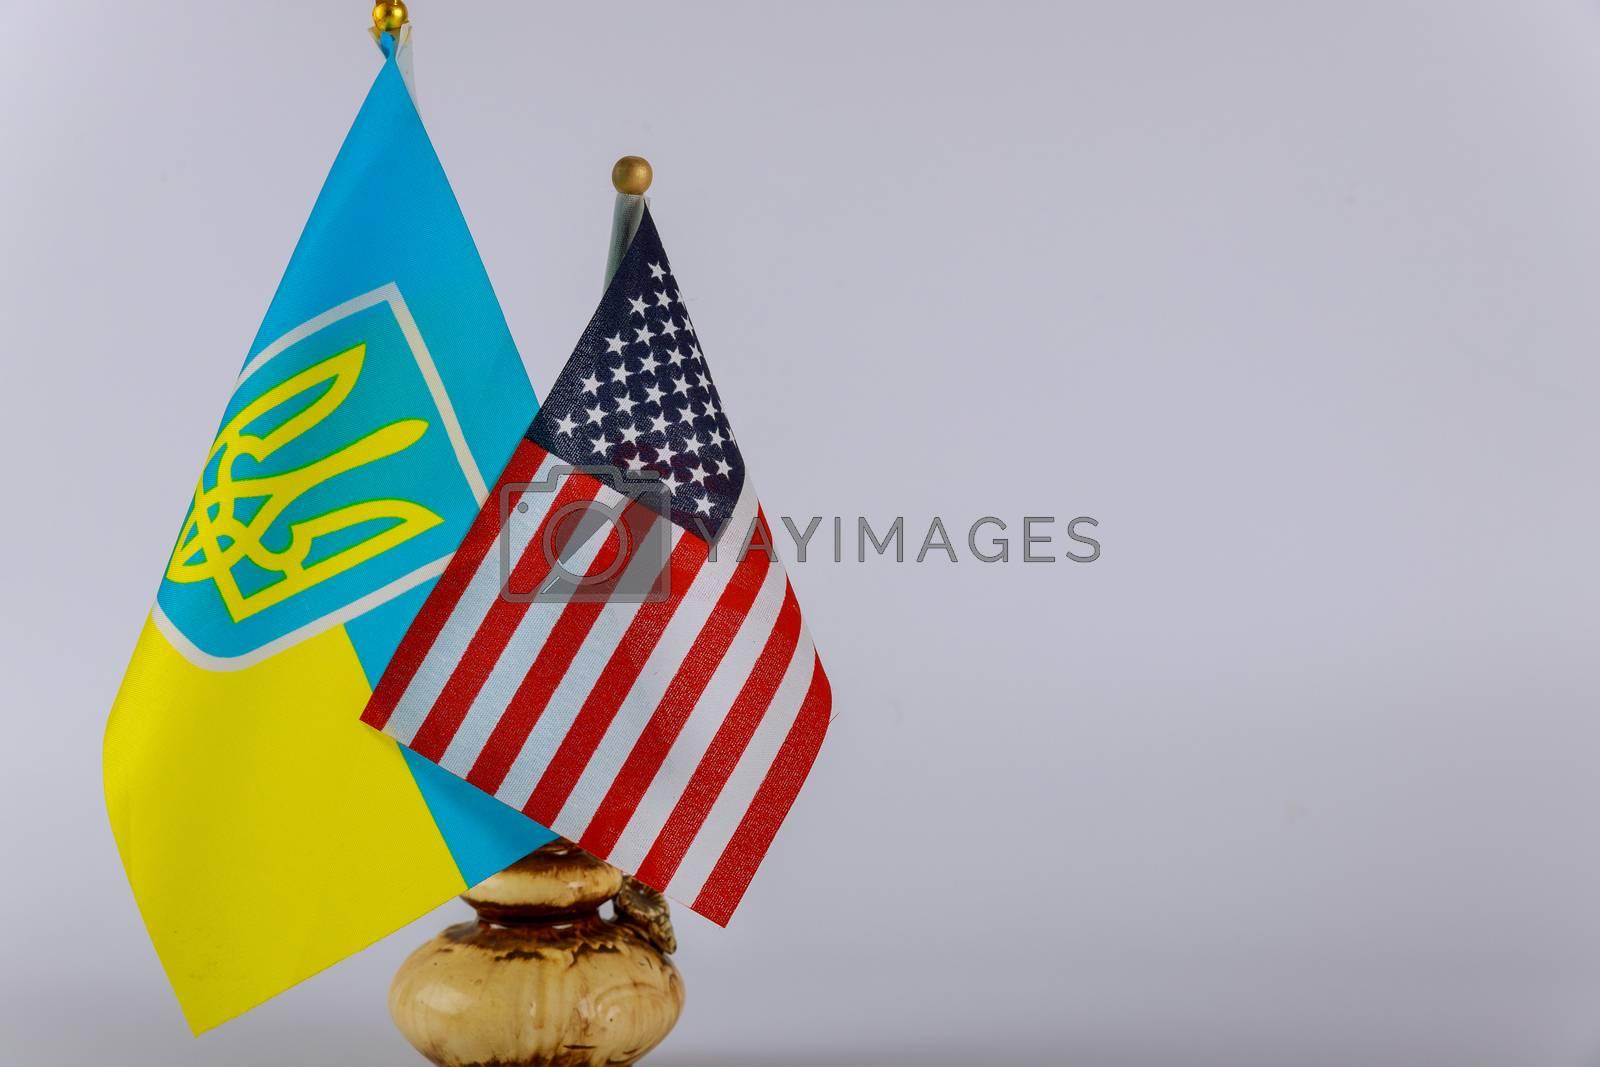 Ukrainian national flags and American flag Symbol of American Ukrainian friendship